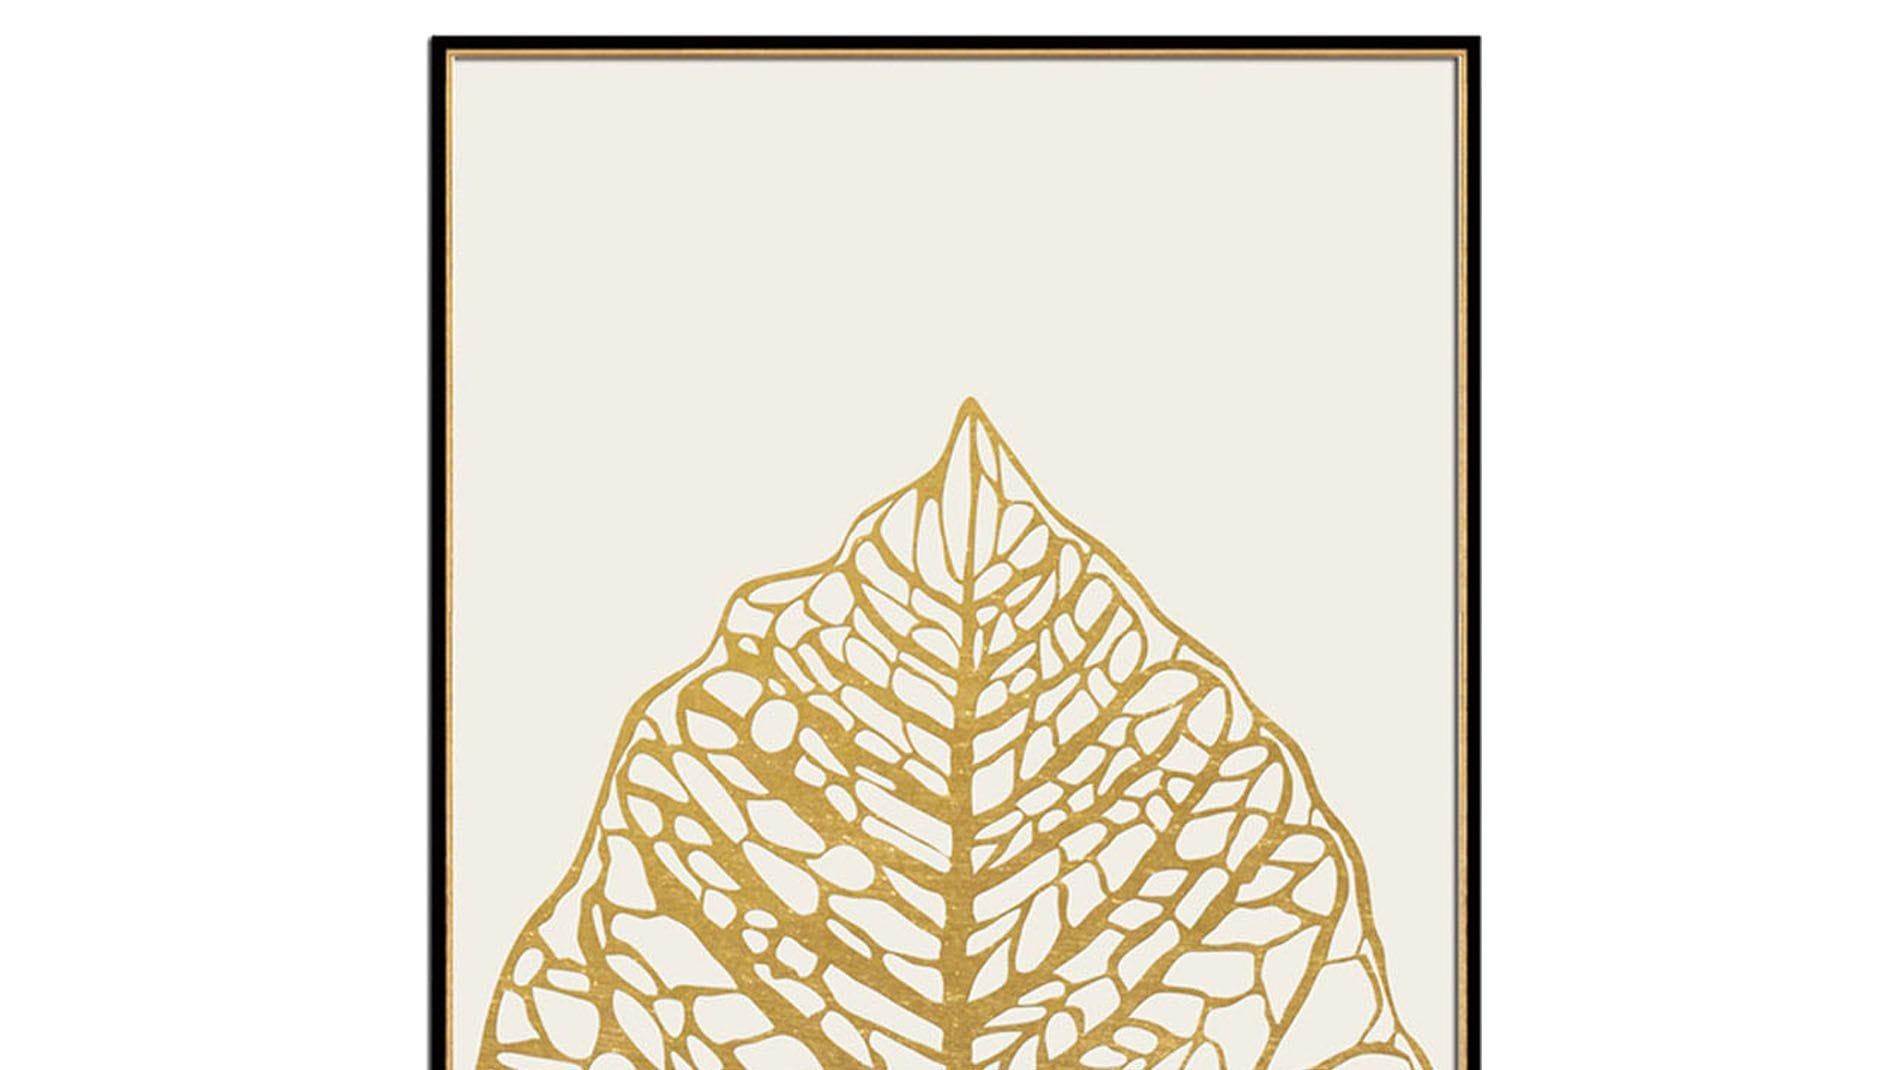 Постер на стену золотой лист на белом 60х80см